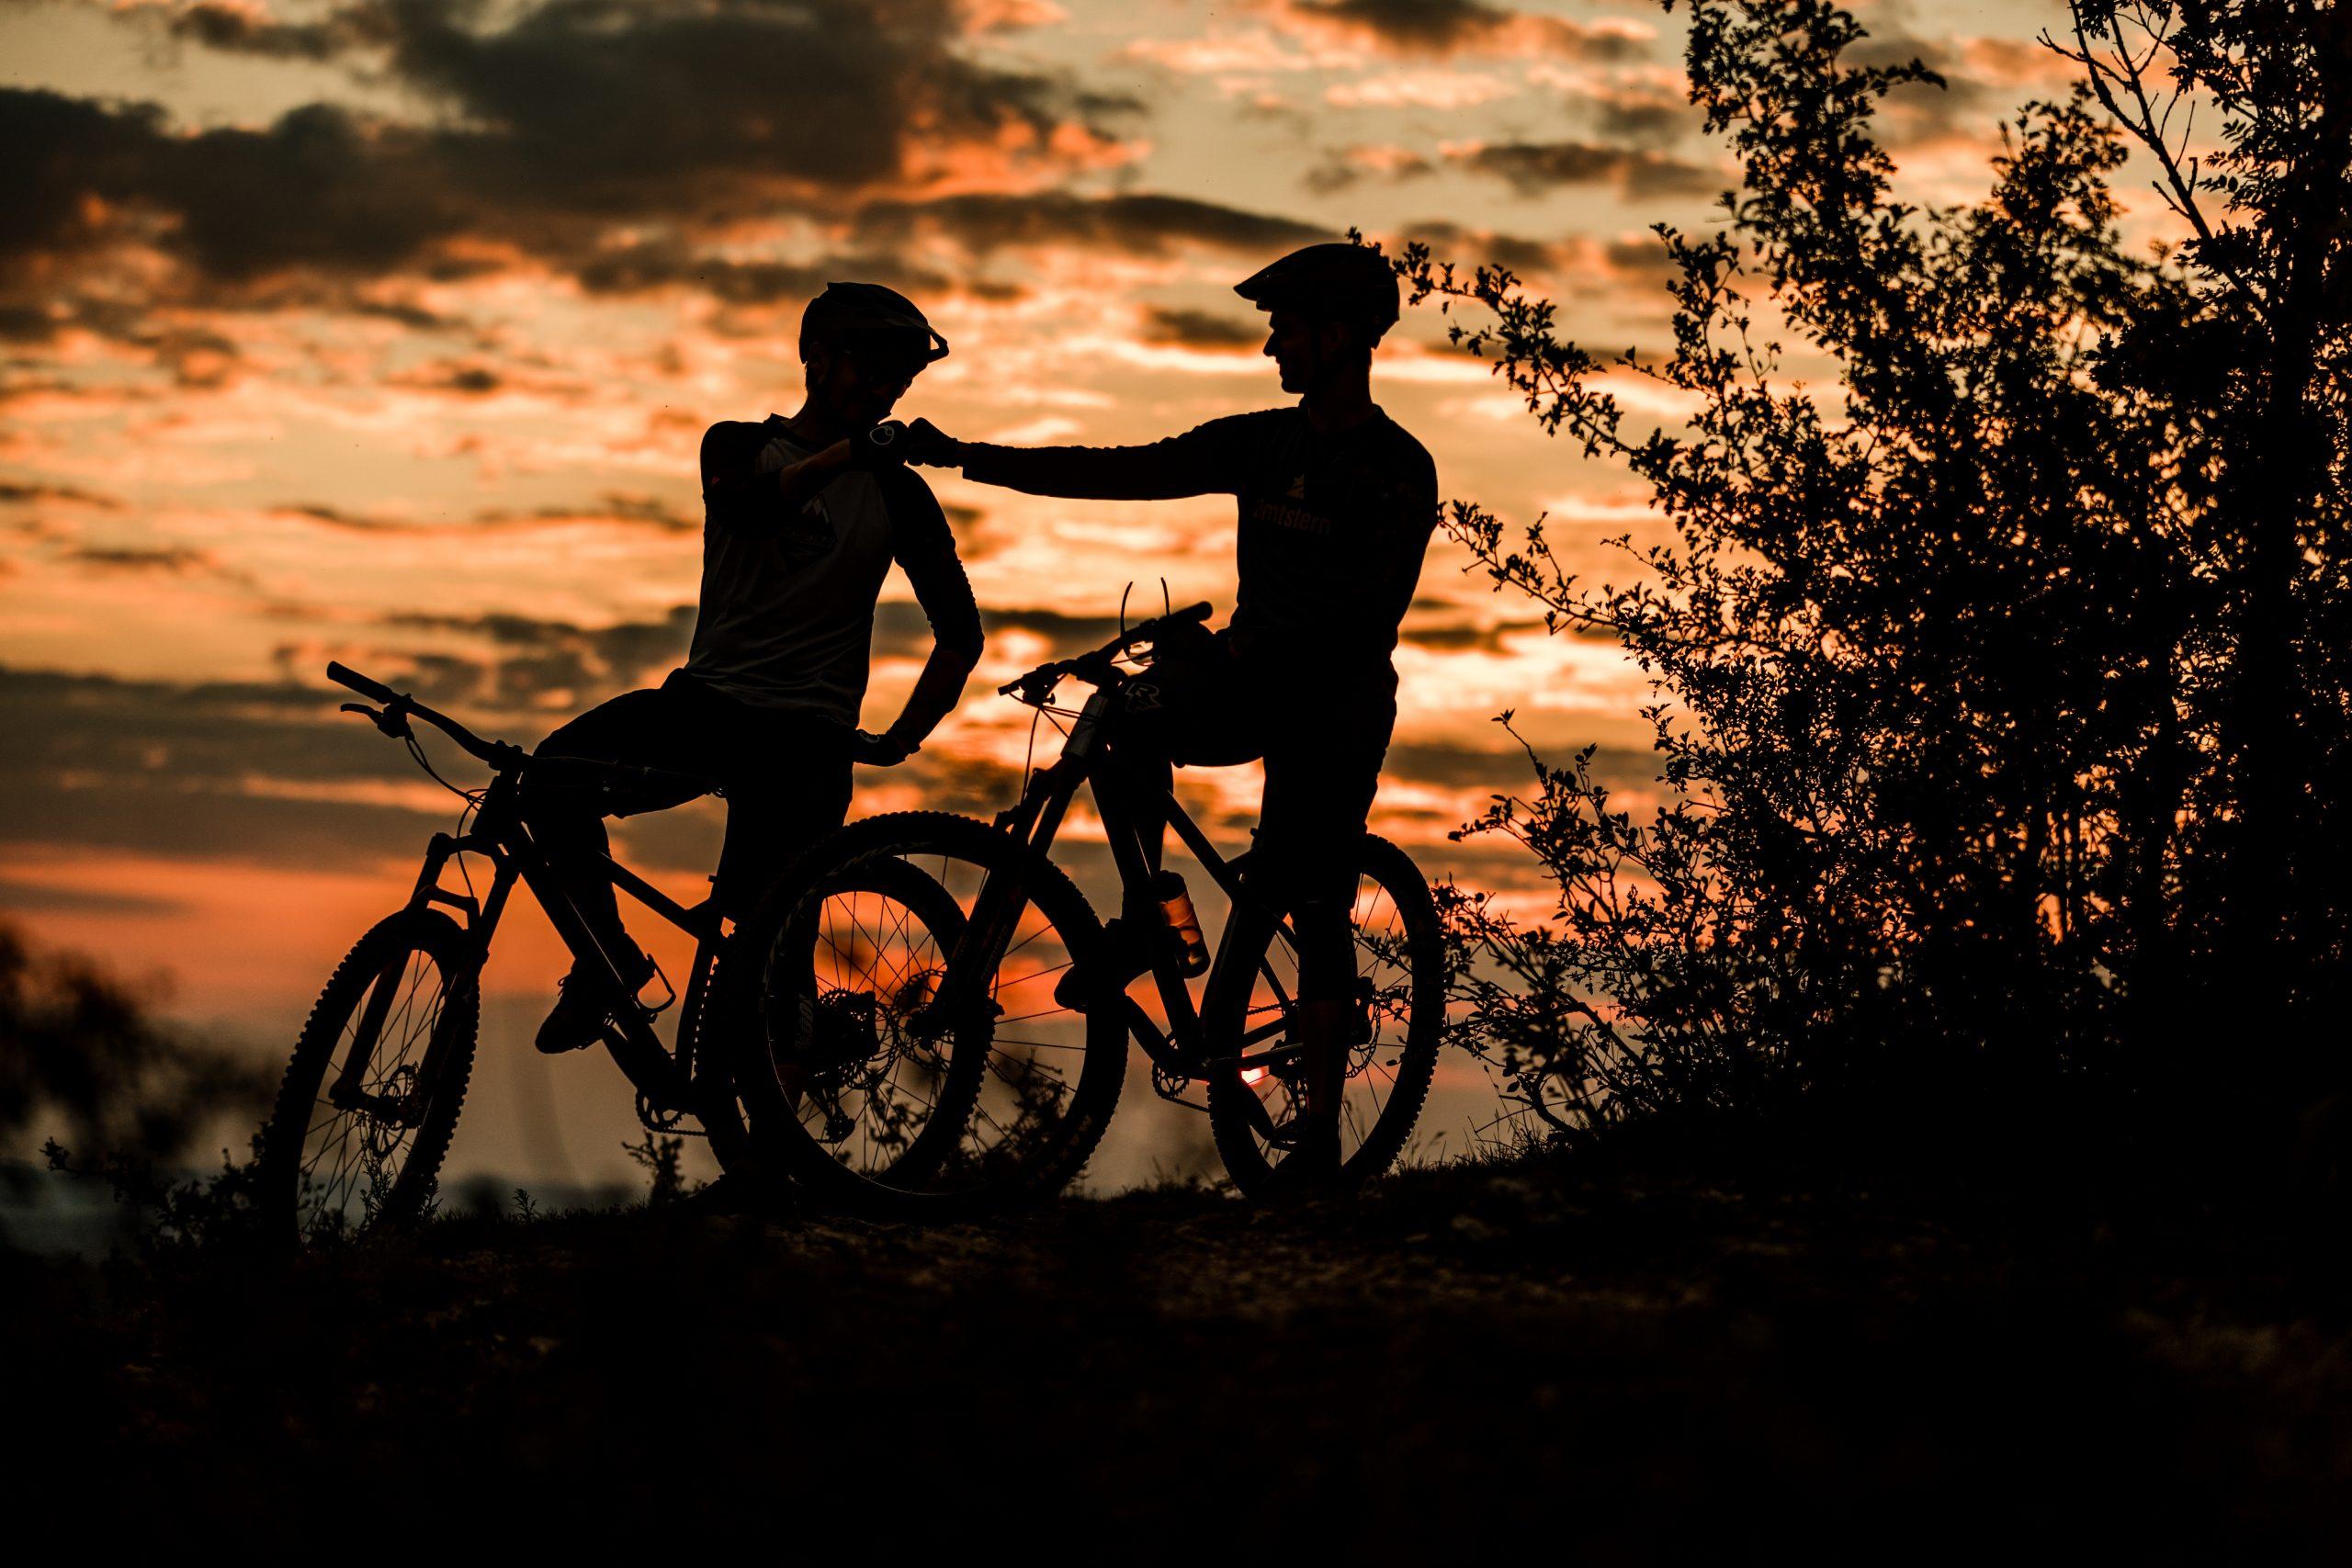 AA0I2079 scaled Cycleholix